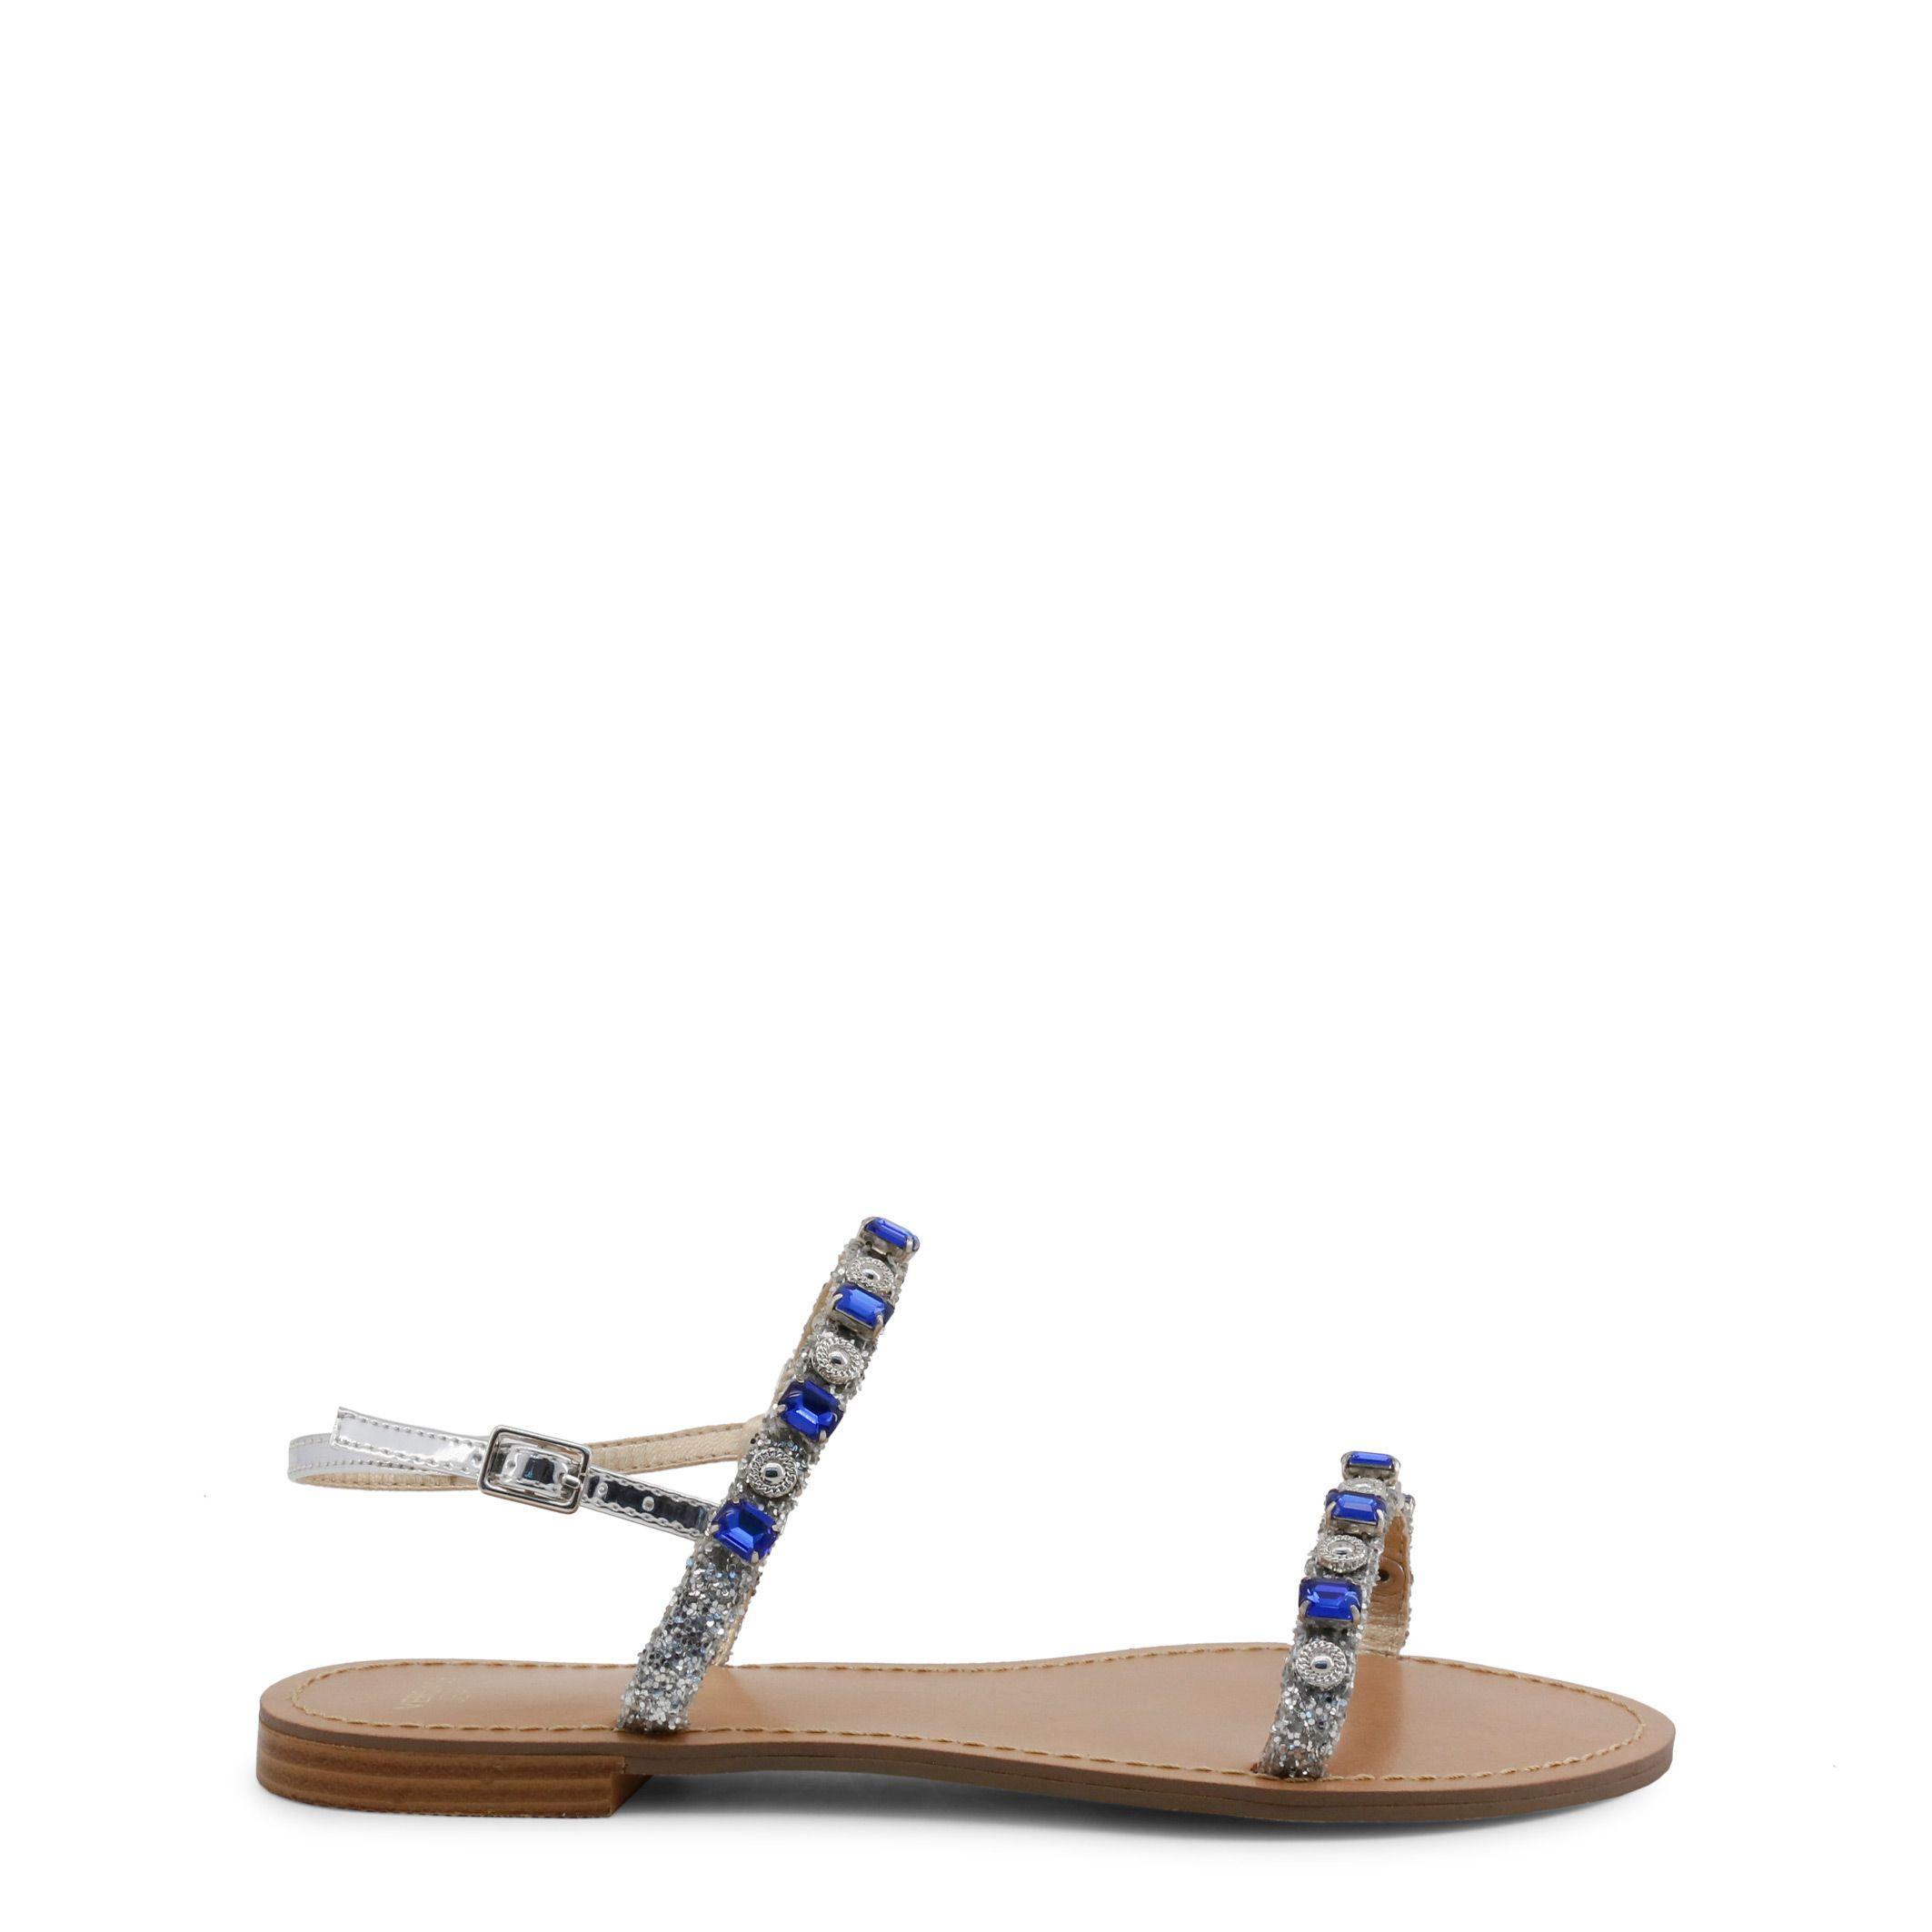 Versace Jeans Womens Sandals